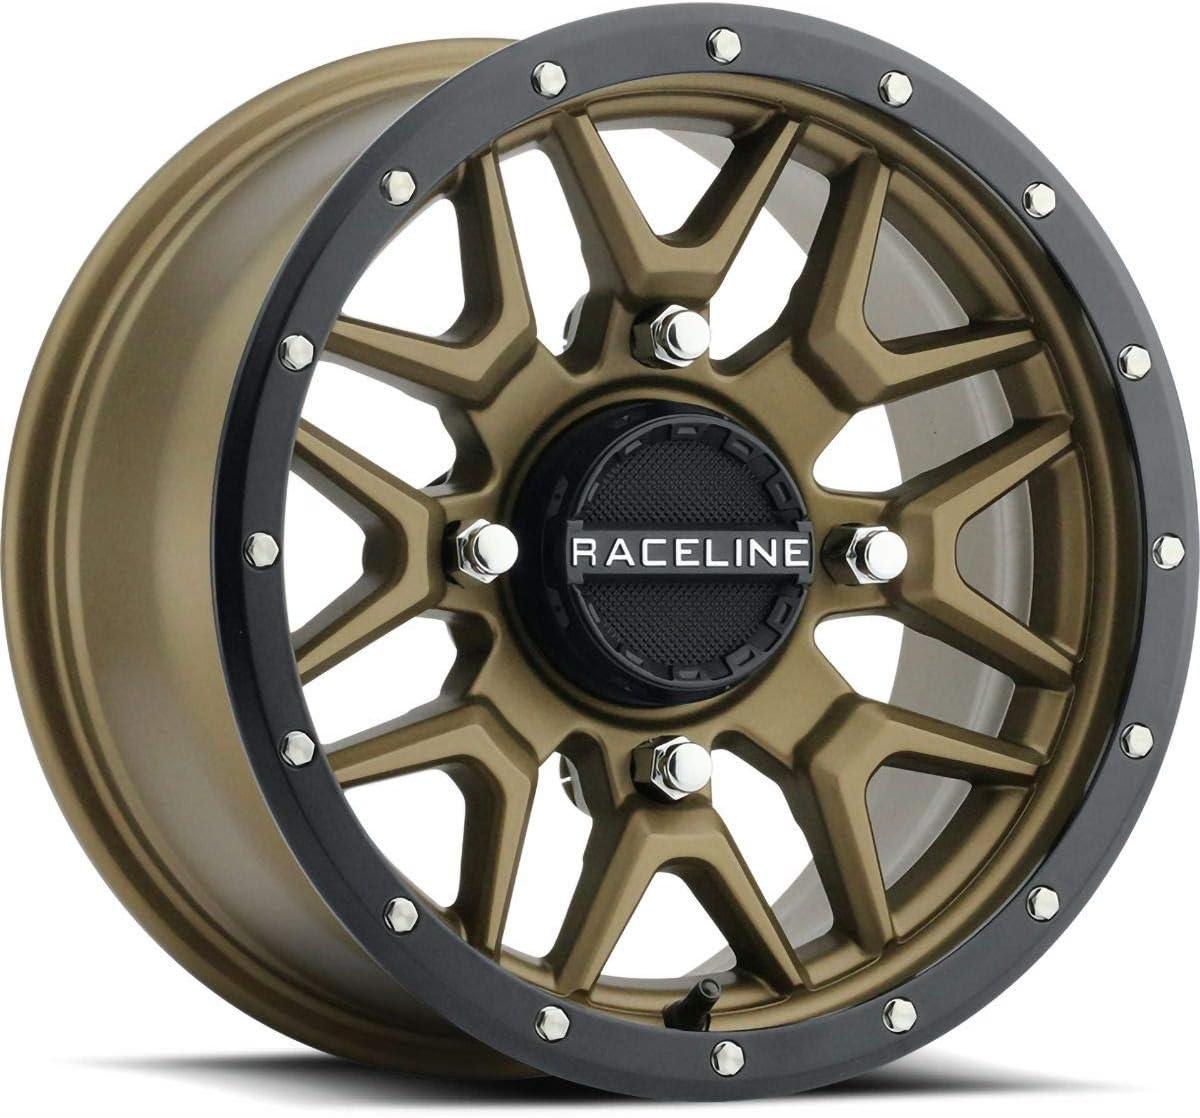 Raceline Krank Department store Wheel Front Rear 14X7 4 Bronze Black 156 Attention brand 5+2